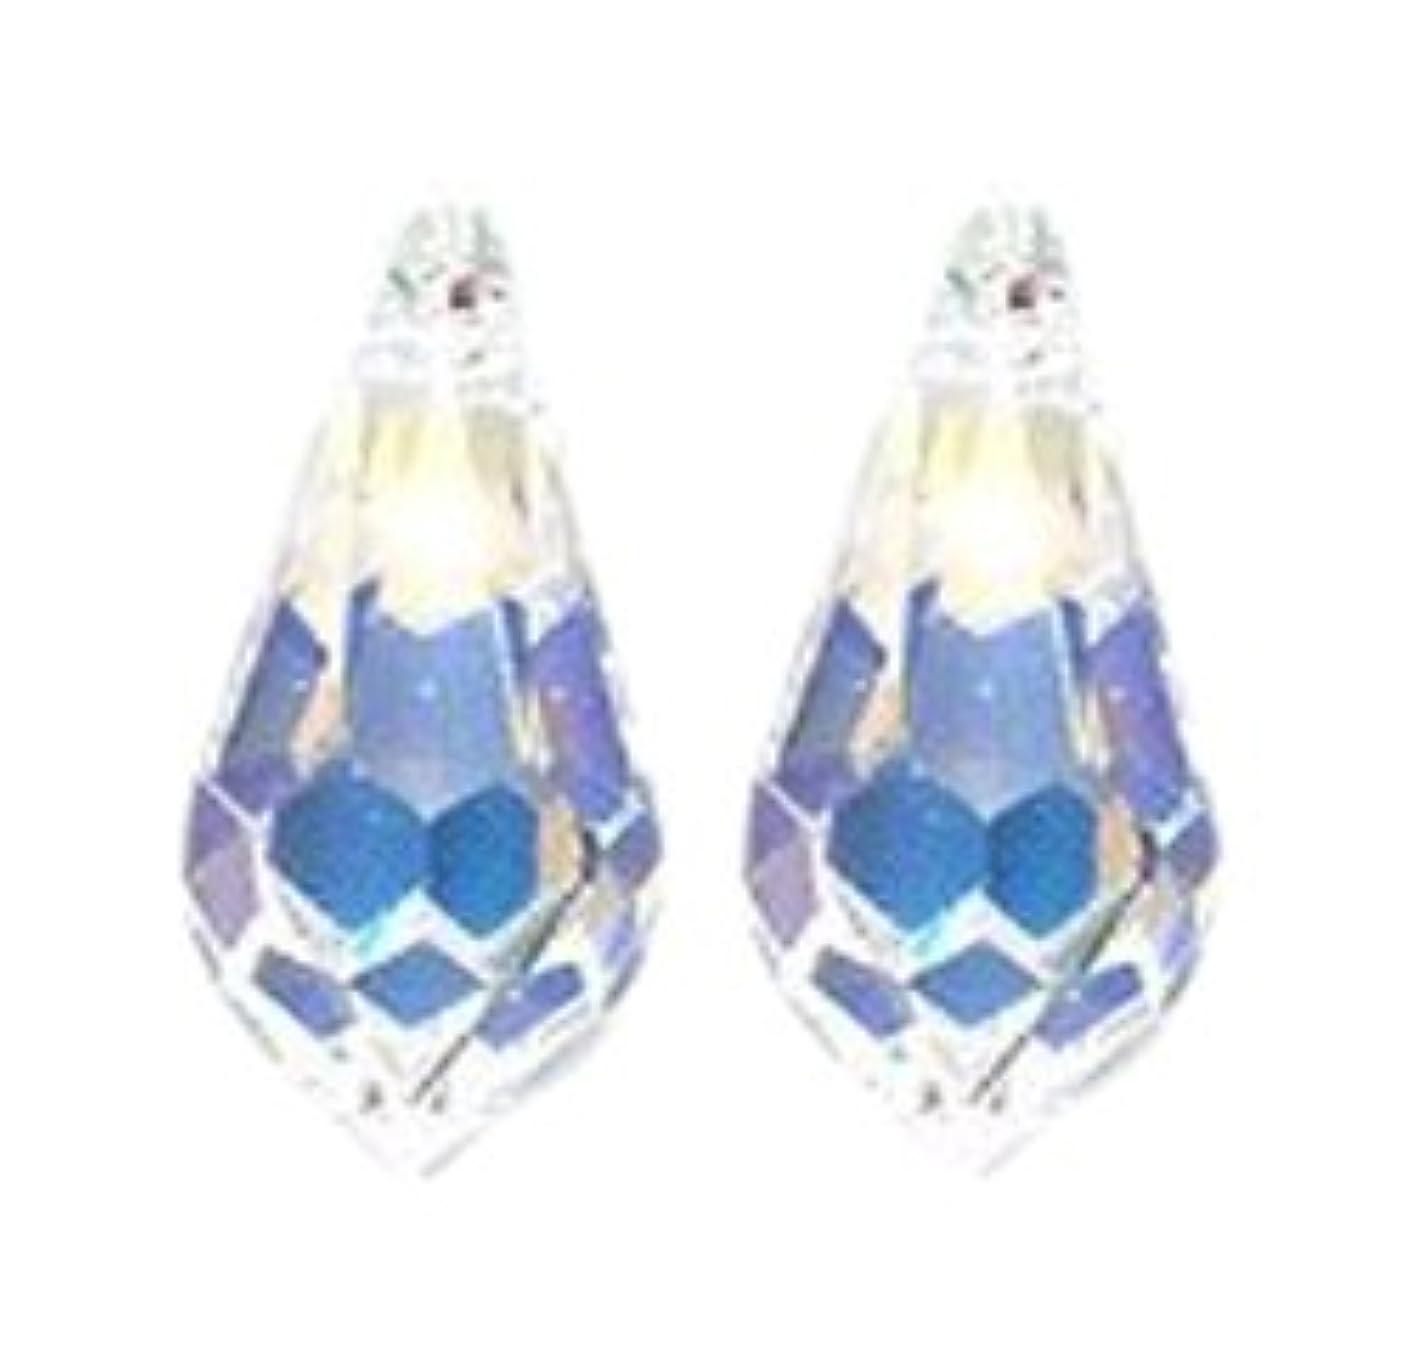 Swarovski 6000 Top Hole Tear Drop Beads, Aurora Borealis, Crystal, 7.5 by 15mm, 4-Pack